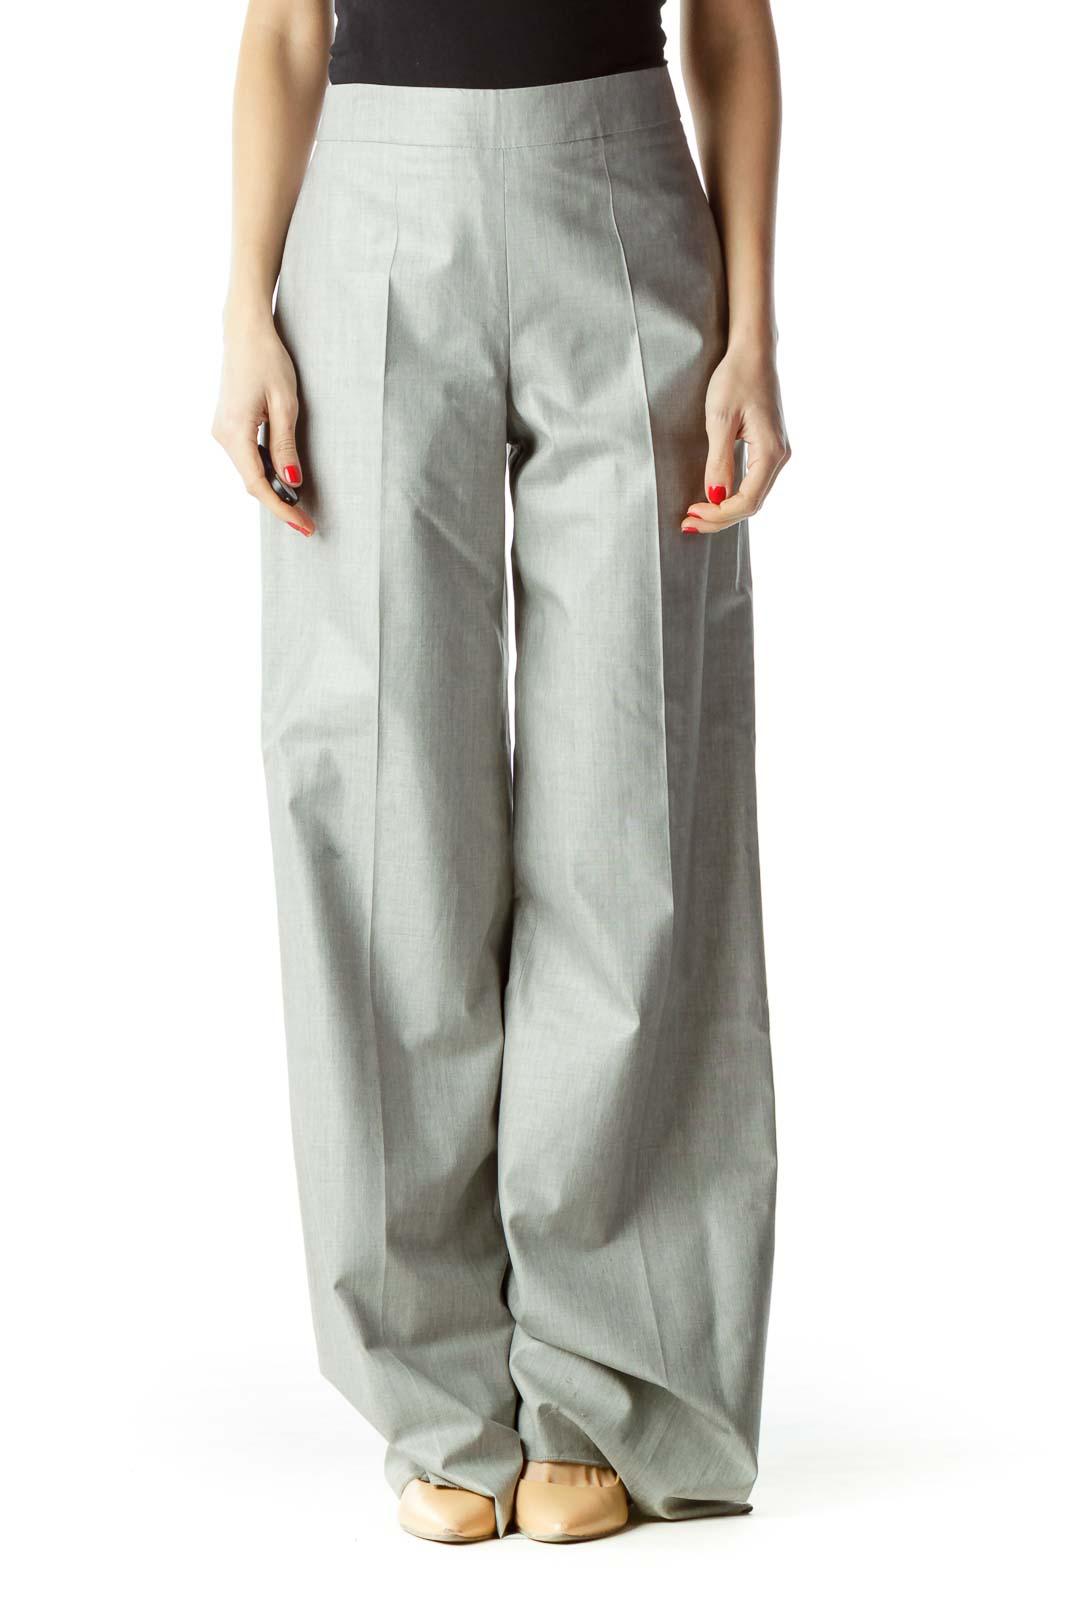 Gray High-Waisted Designer Dress Pants